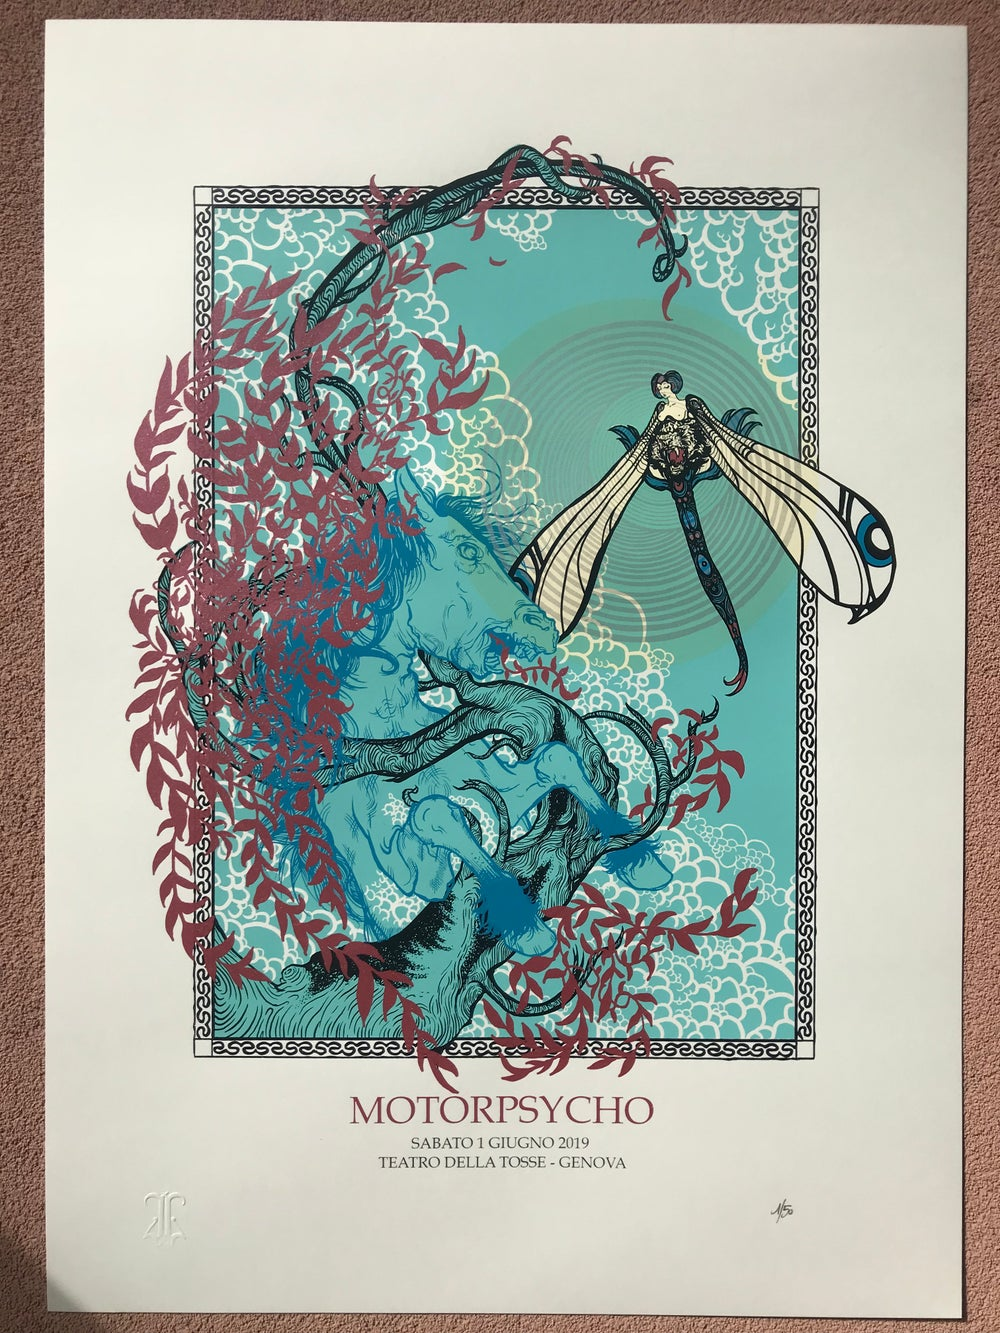 Image of MOTORPSYCHO at Teatro della Tosse - Genova